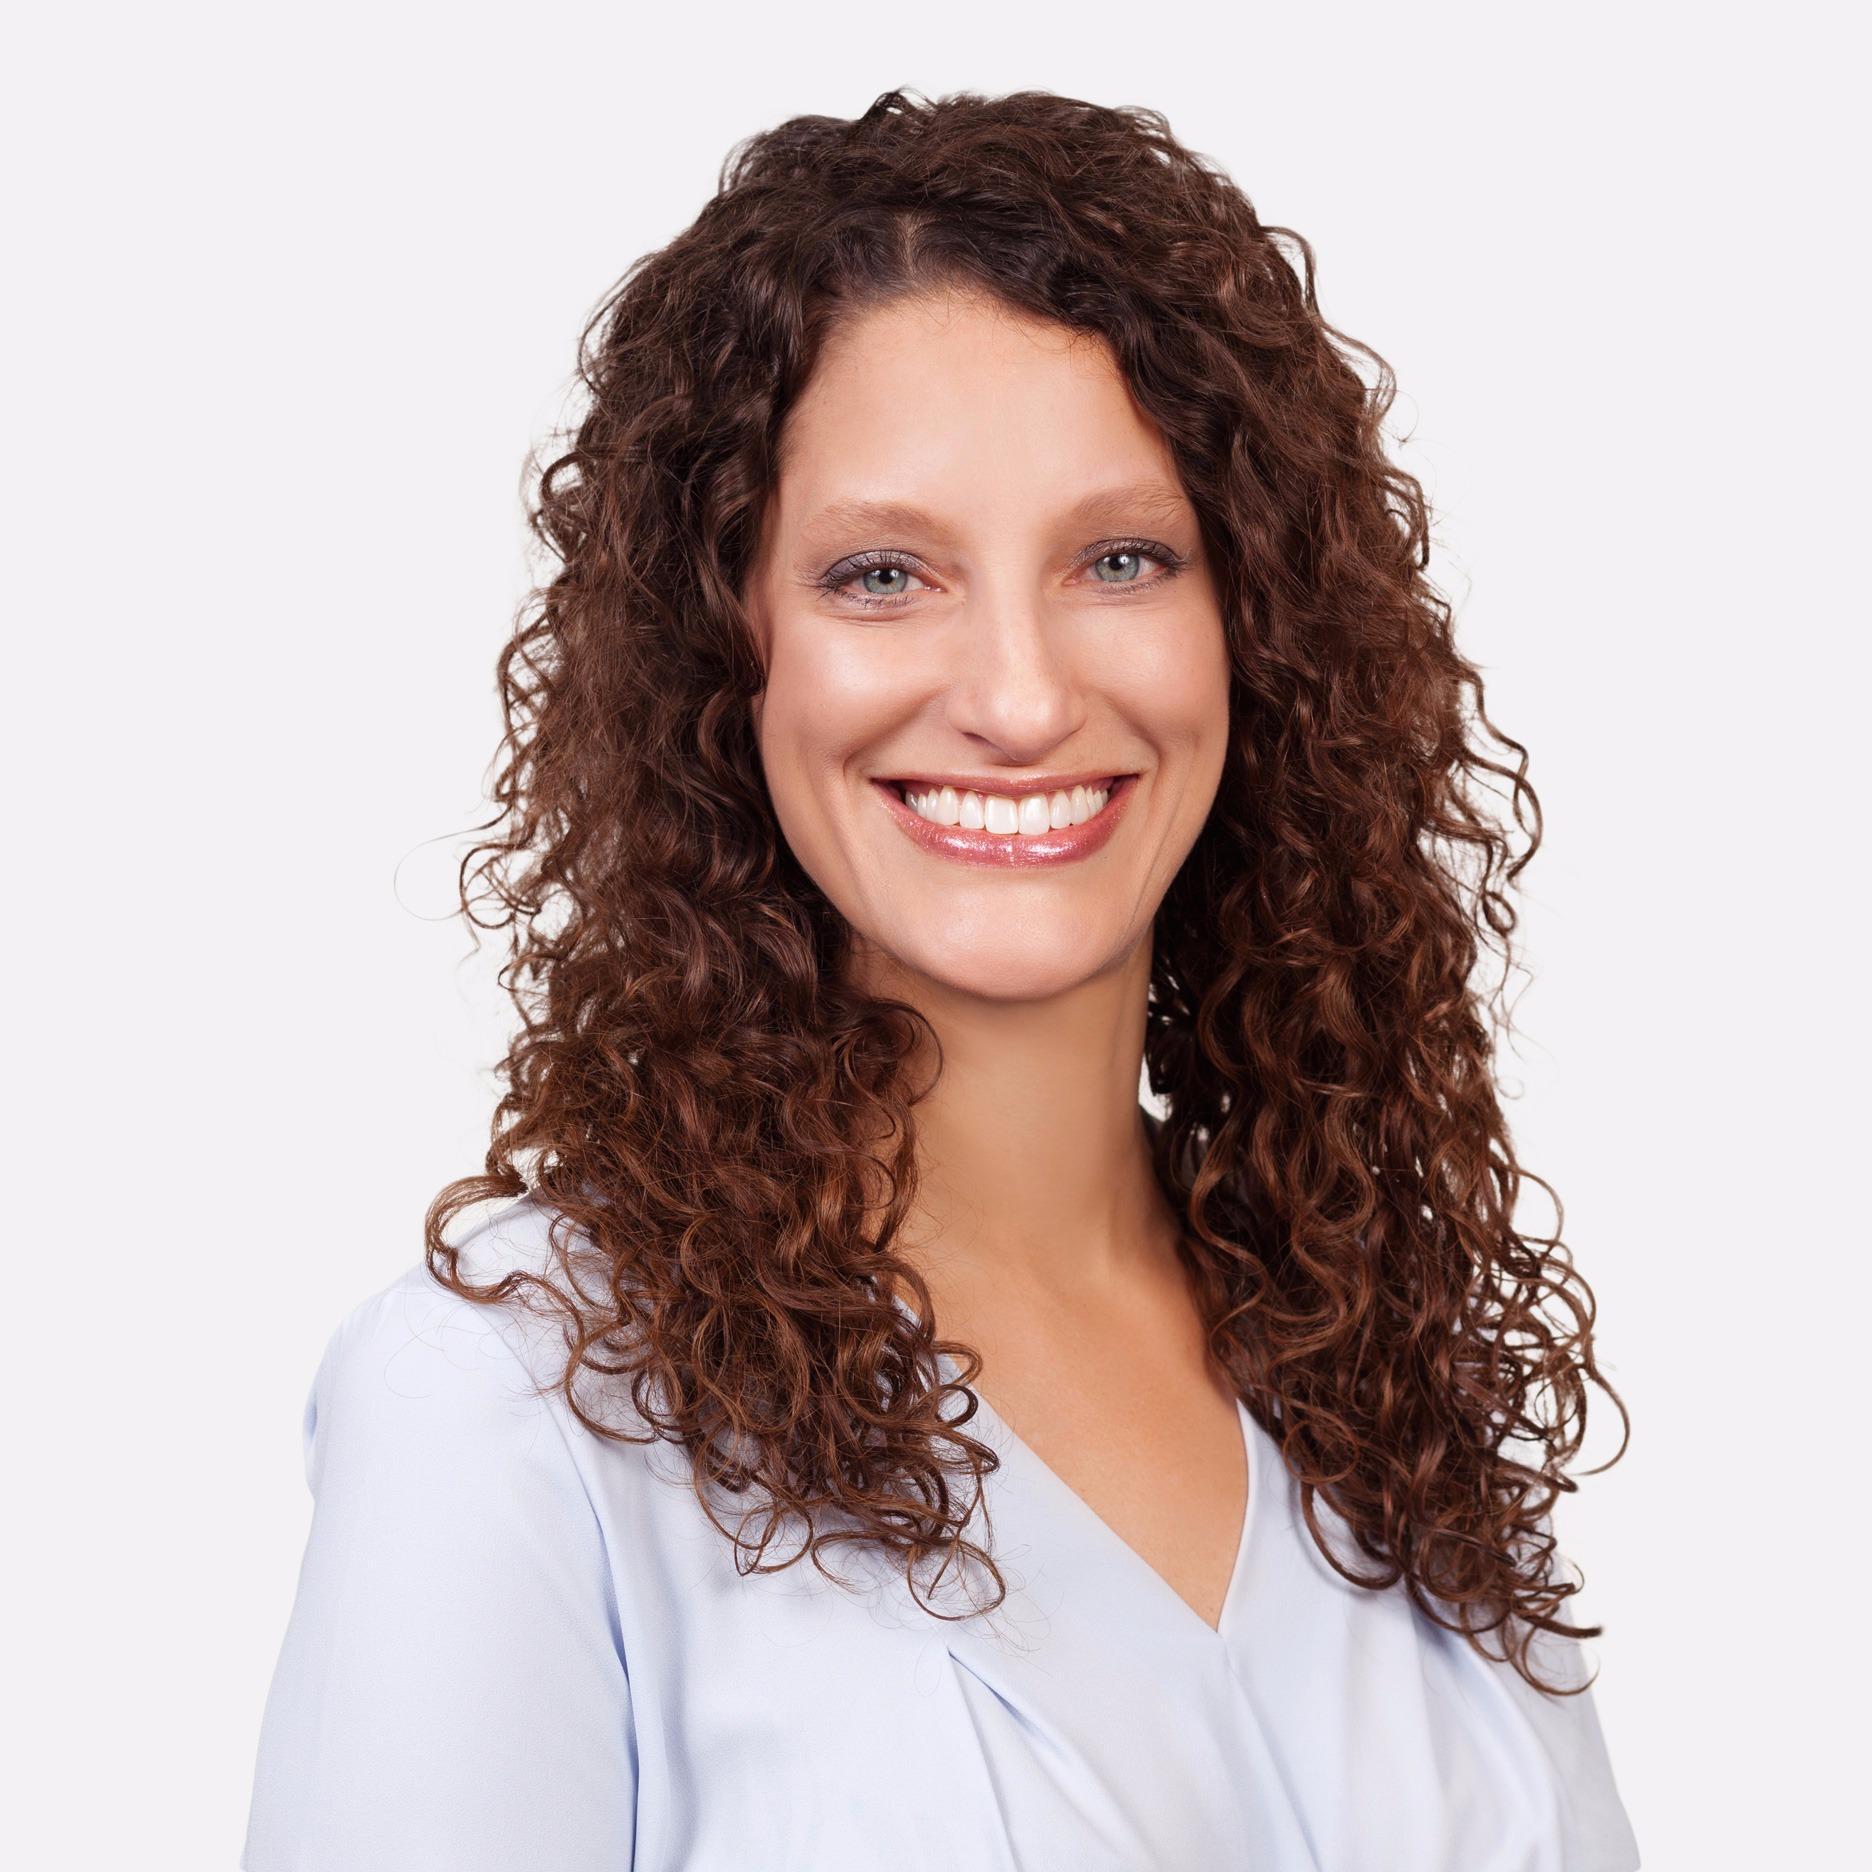 Dr. Terri Barbee